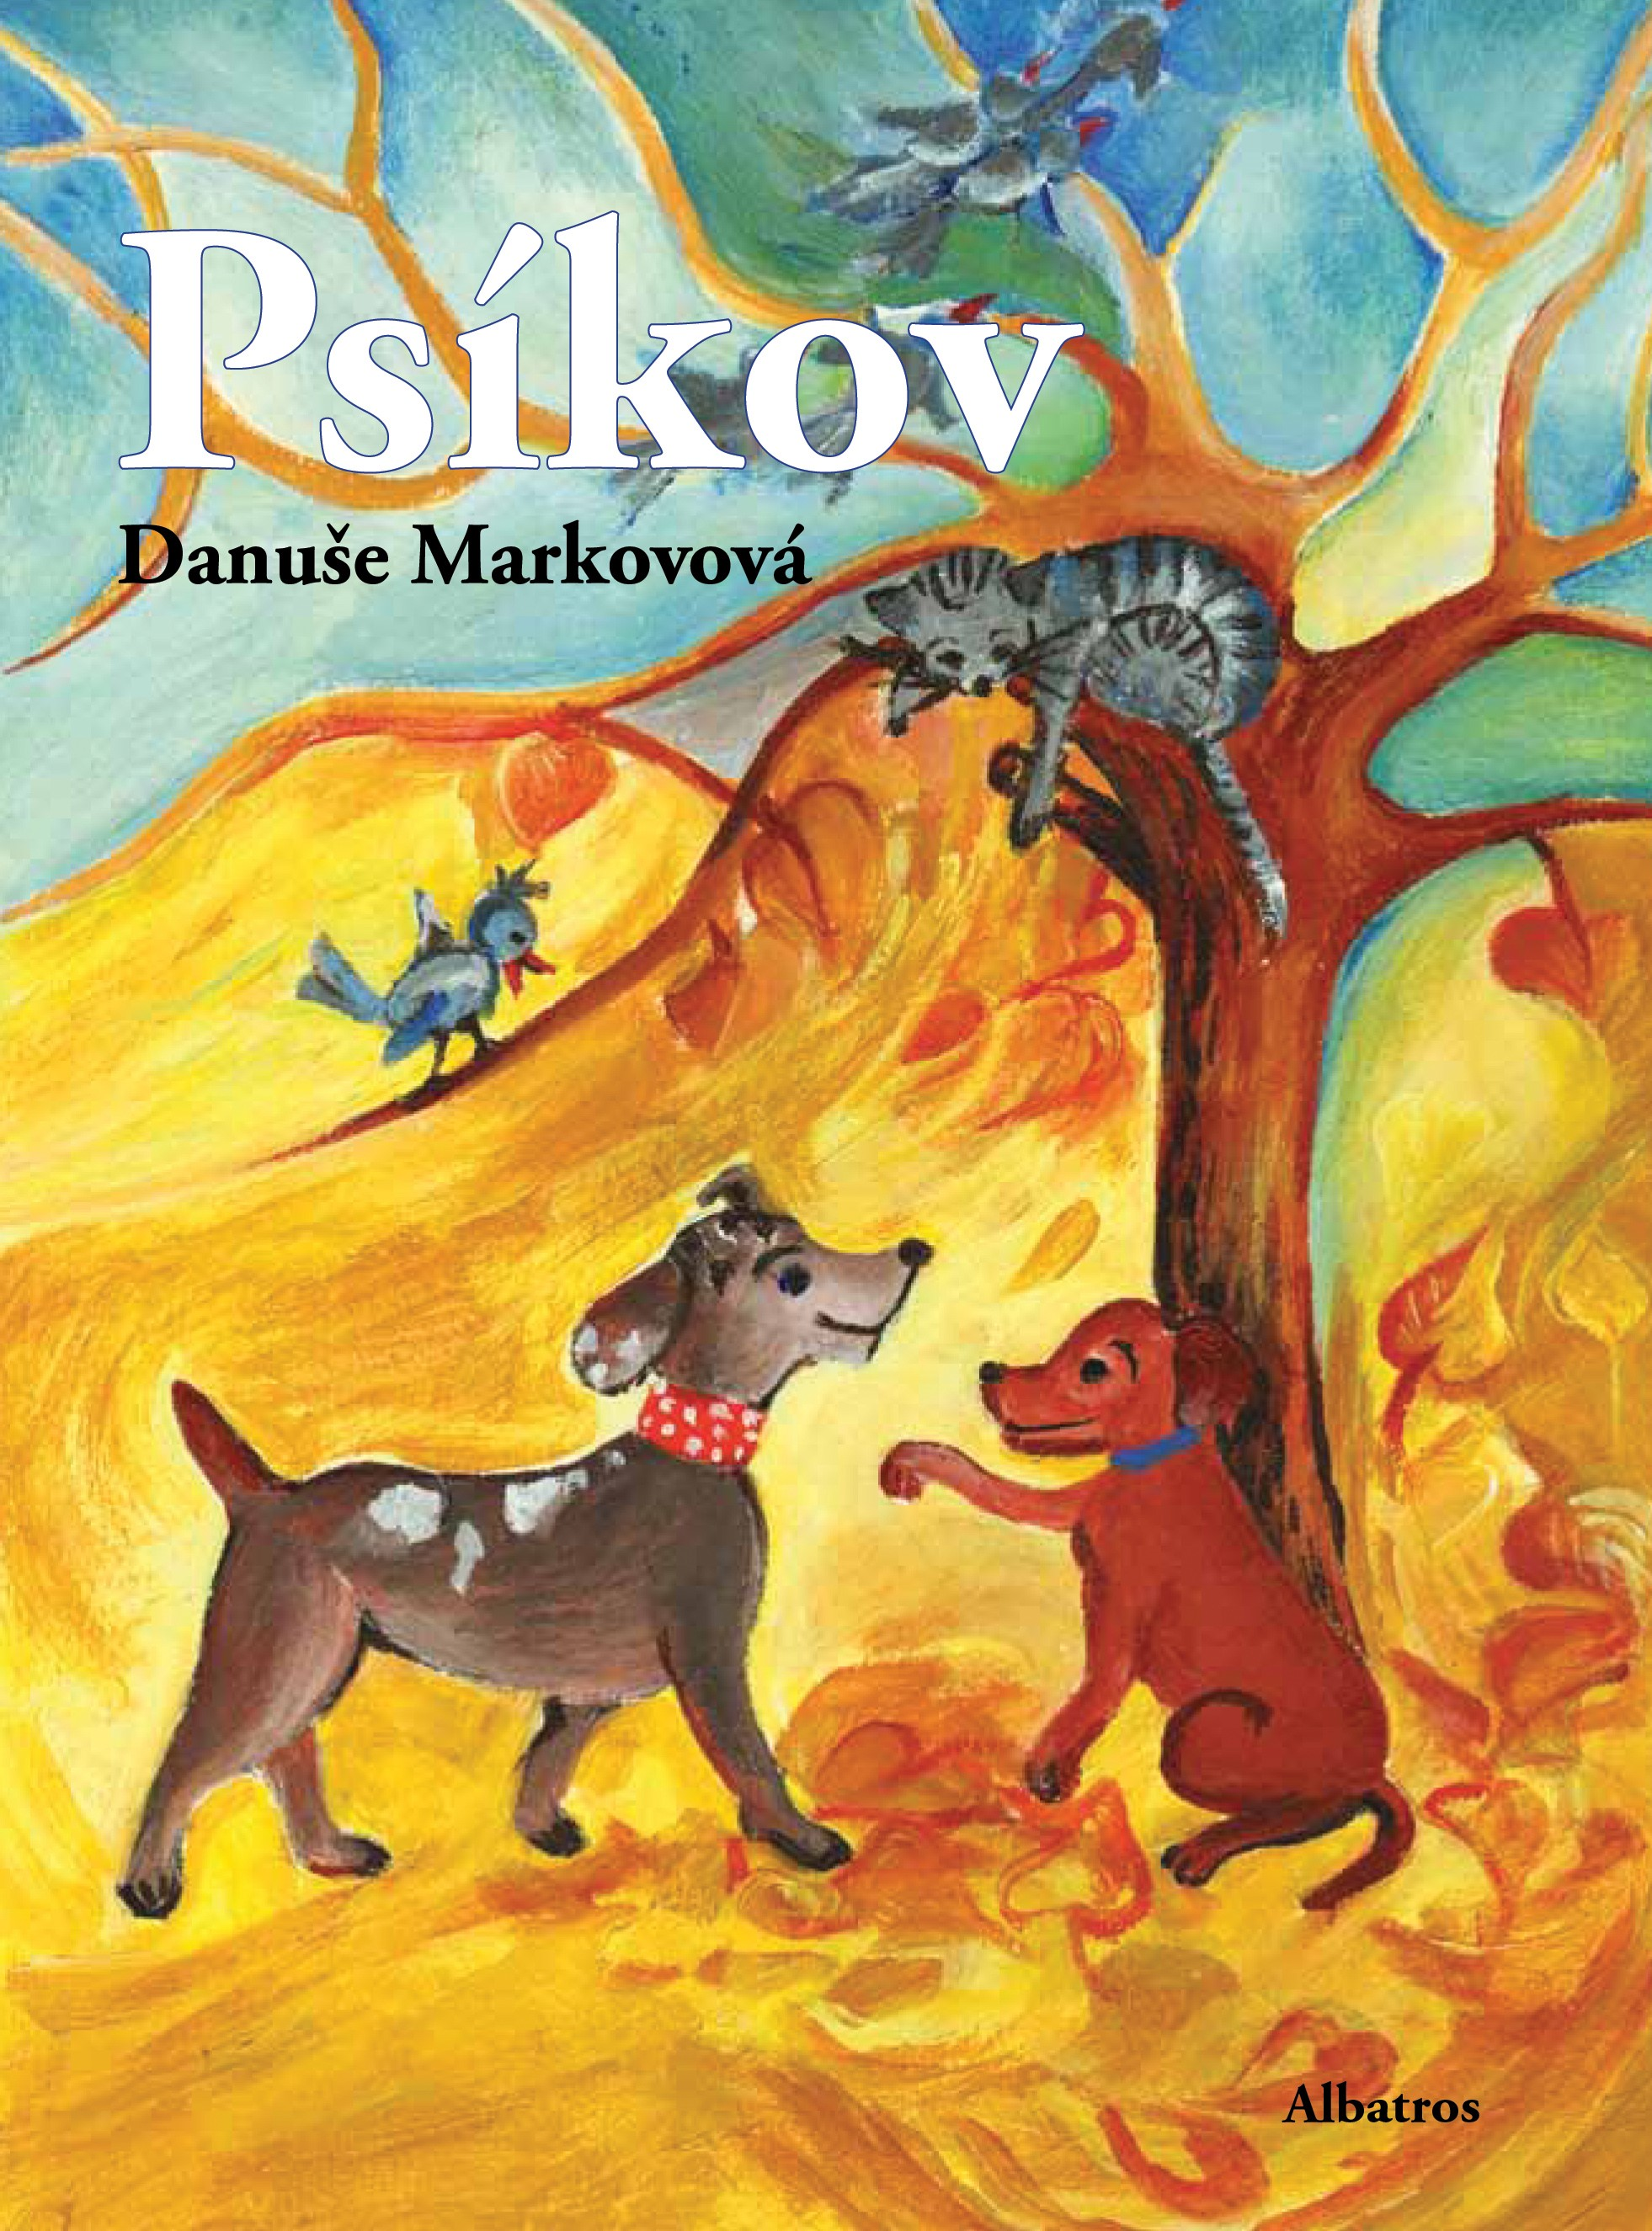 Psíkov | Danuše Markovová, Danuše Markovová